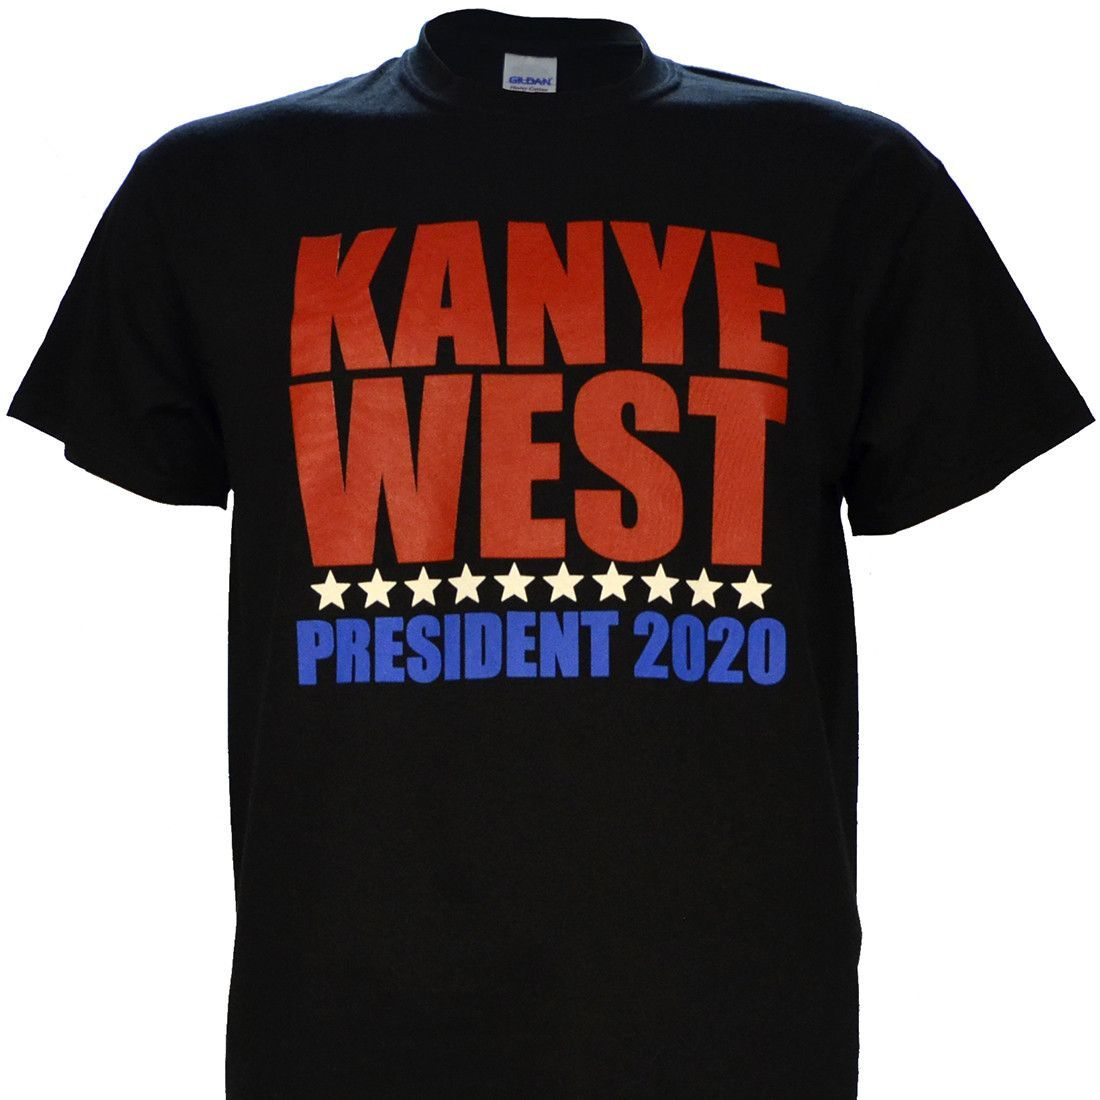 Kanye West For President 2020 On Black Short Sleeve T Shirt With Images Kanye West Political Shirts Deadpool Shirt